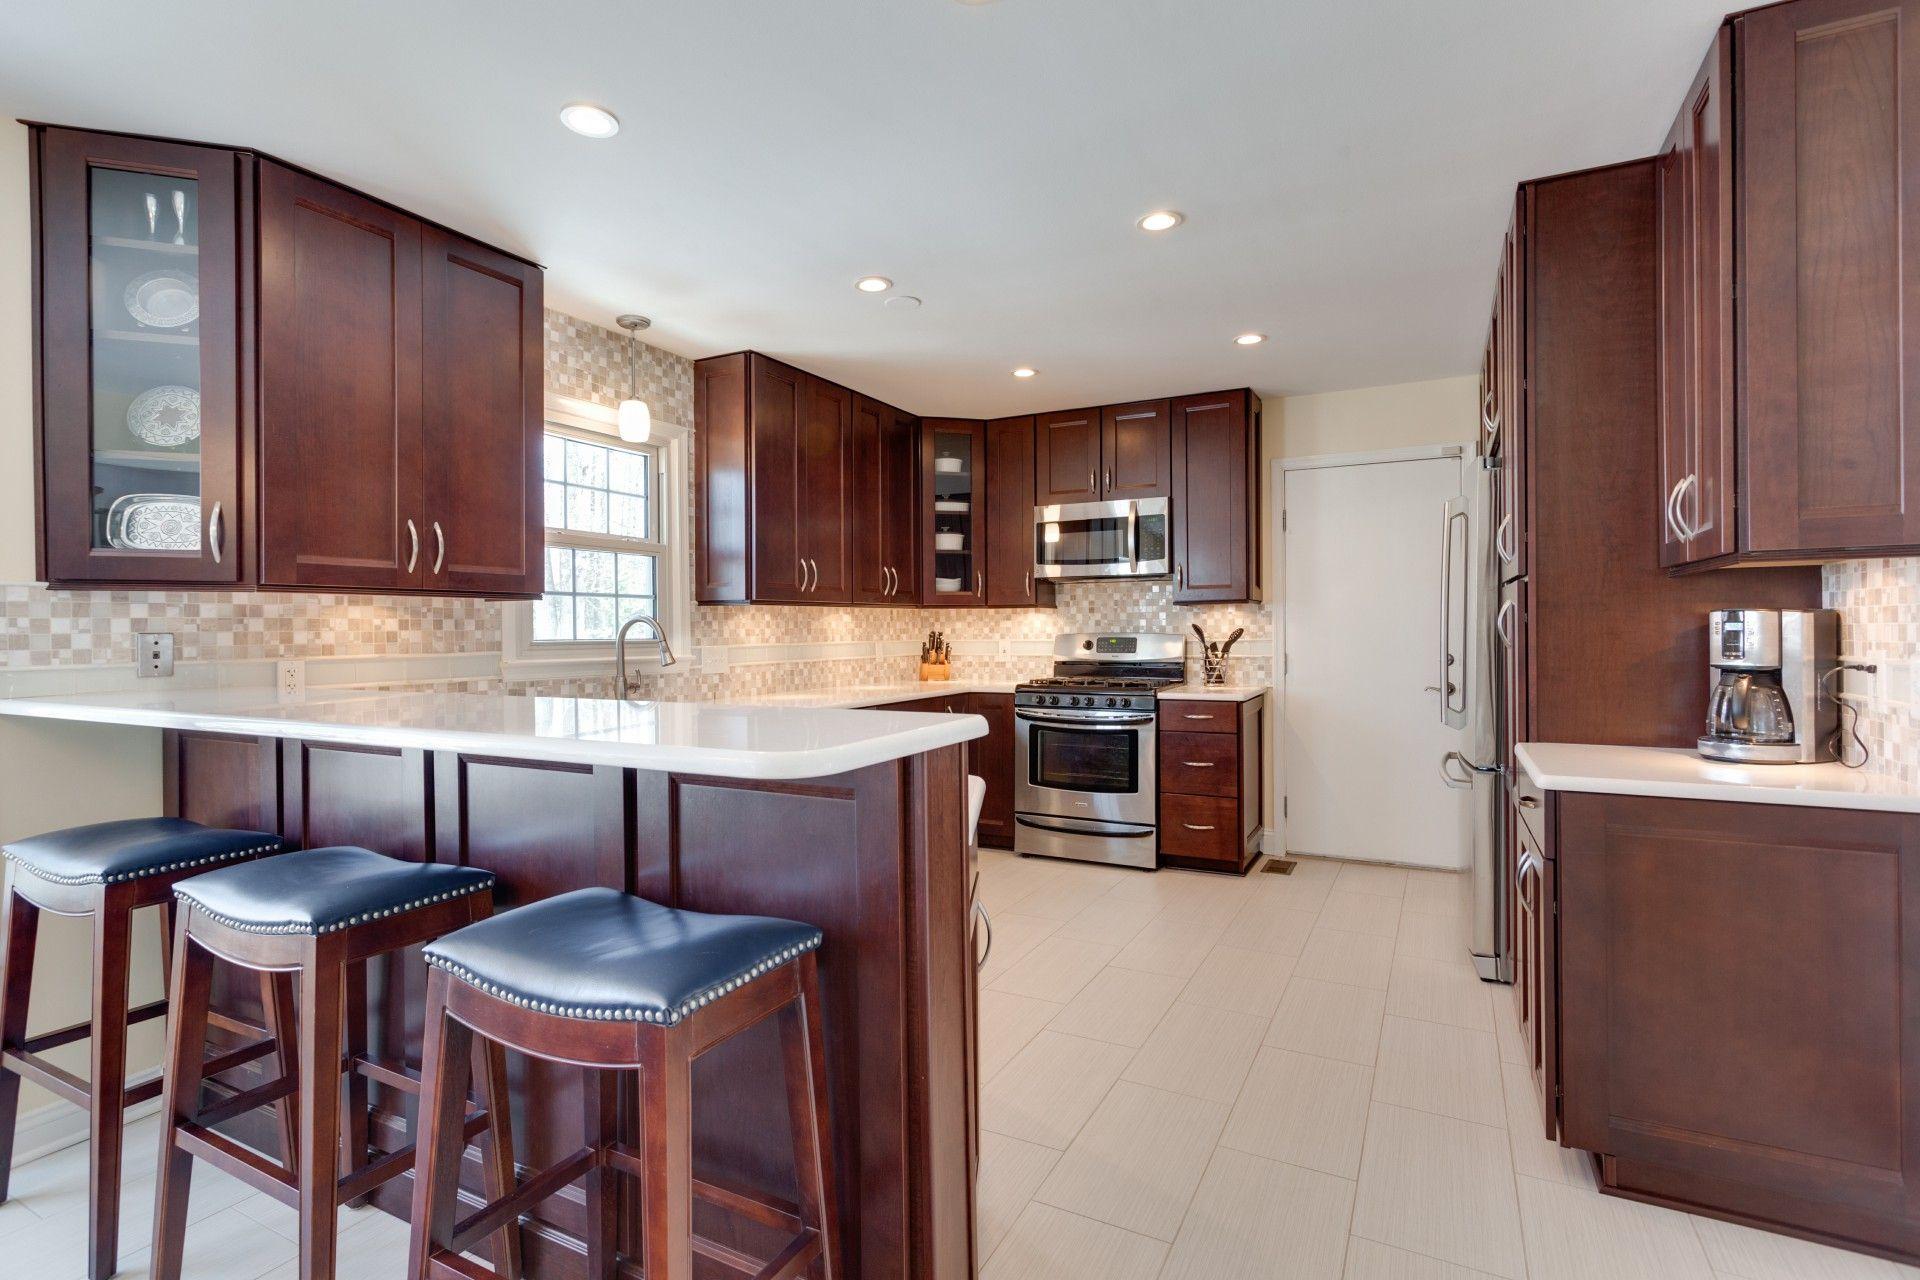 Kitchen Remodeling, Kitchen renovation in northern ...